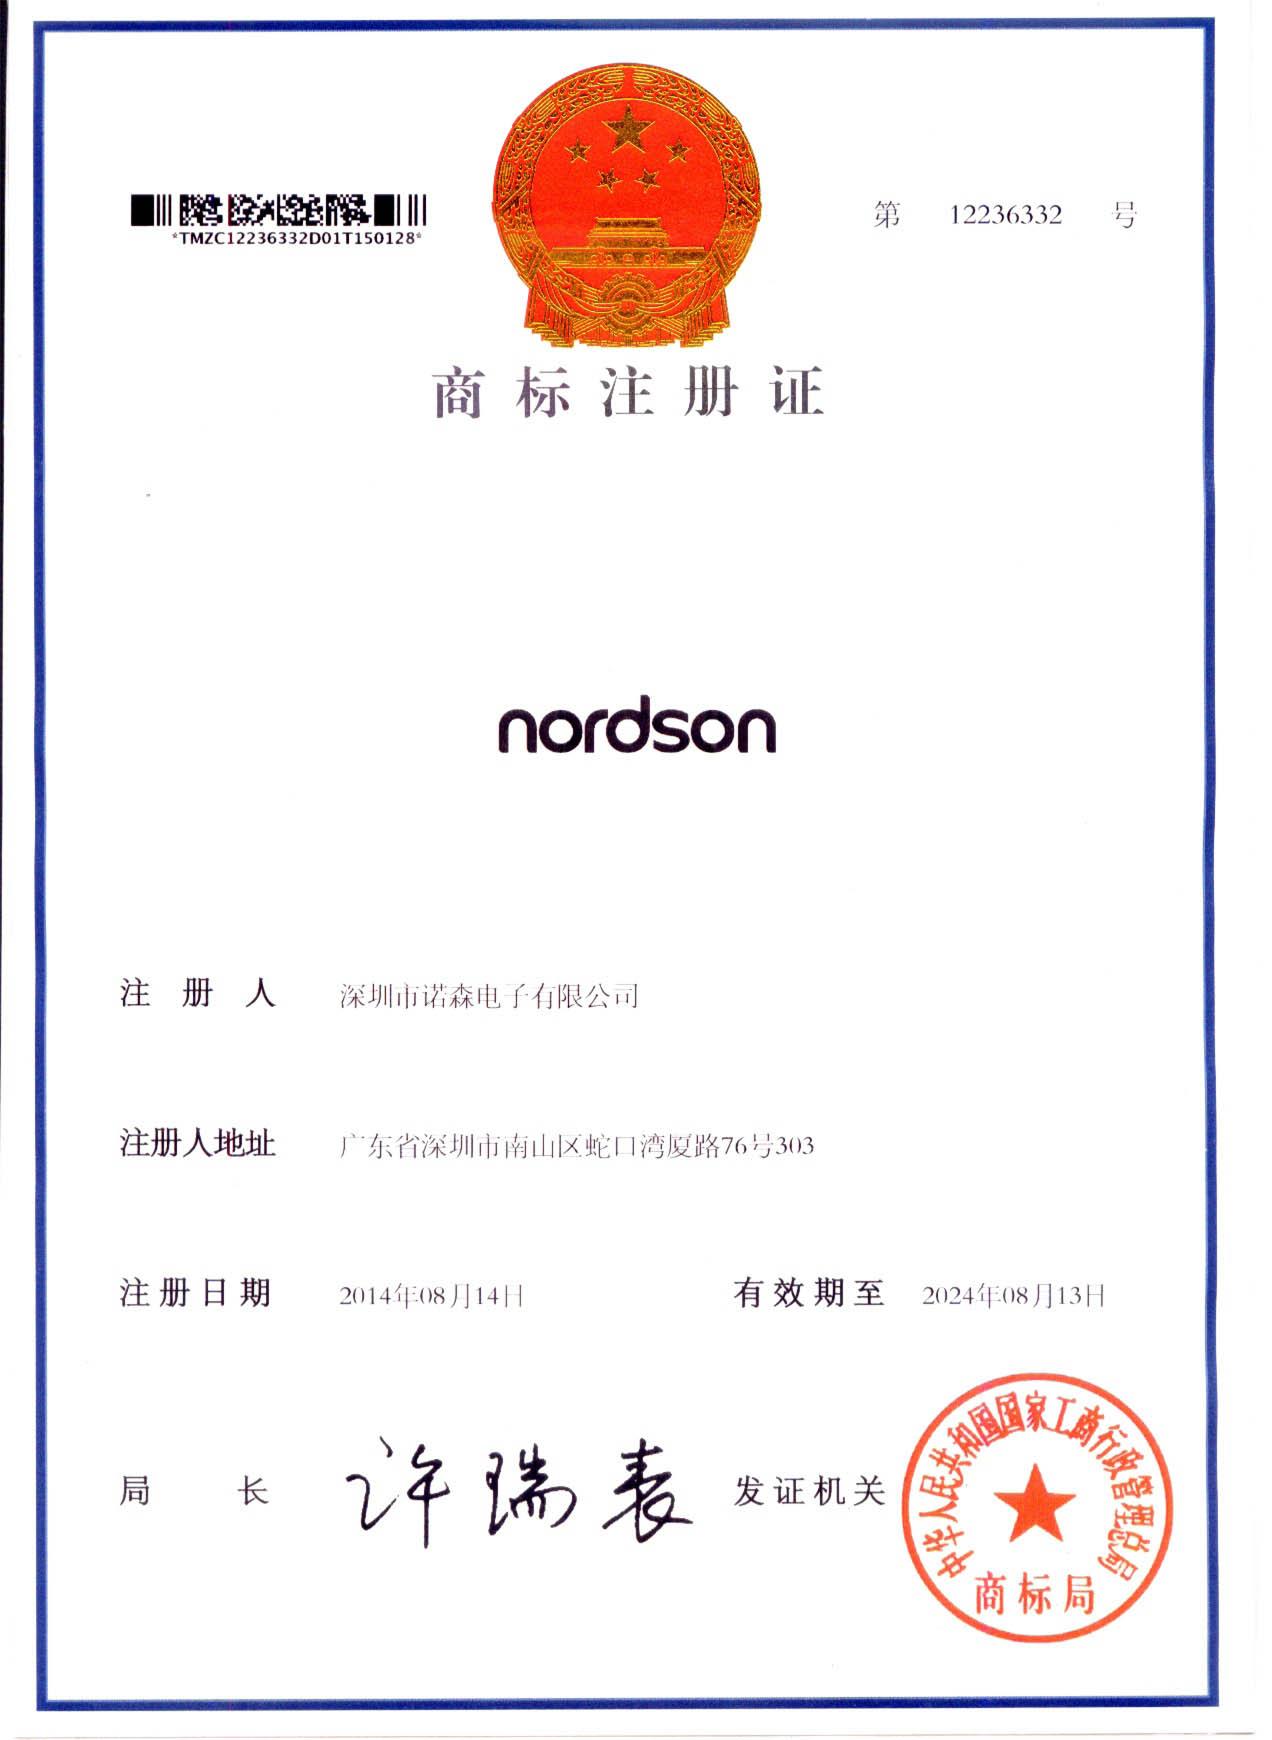 Nordson Registered Trademark